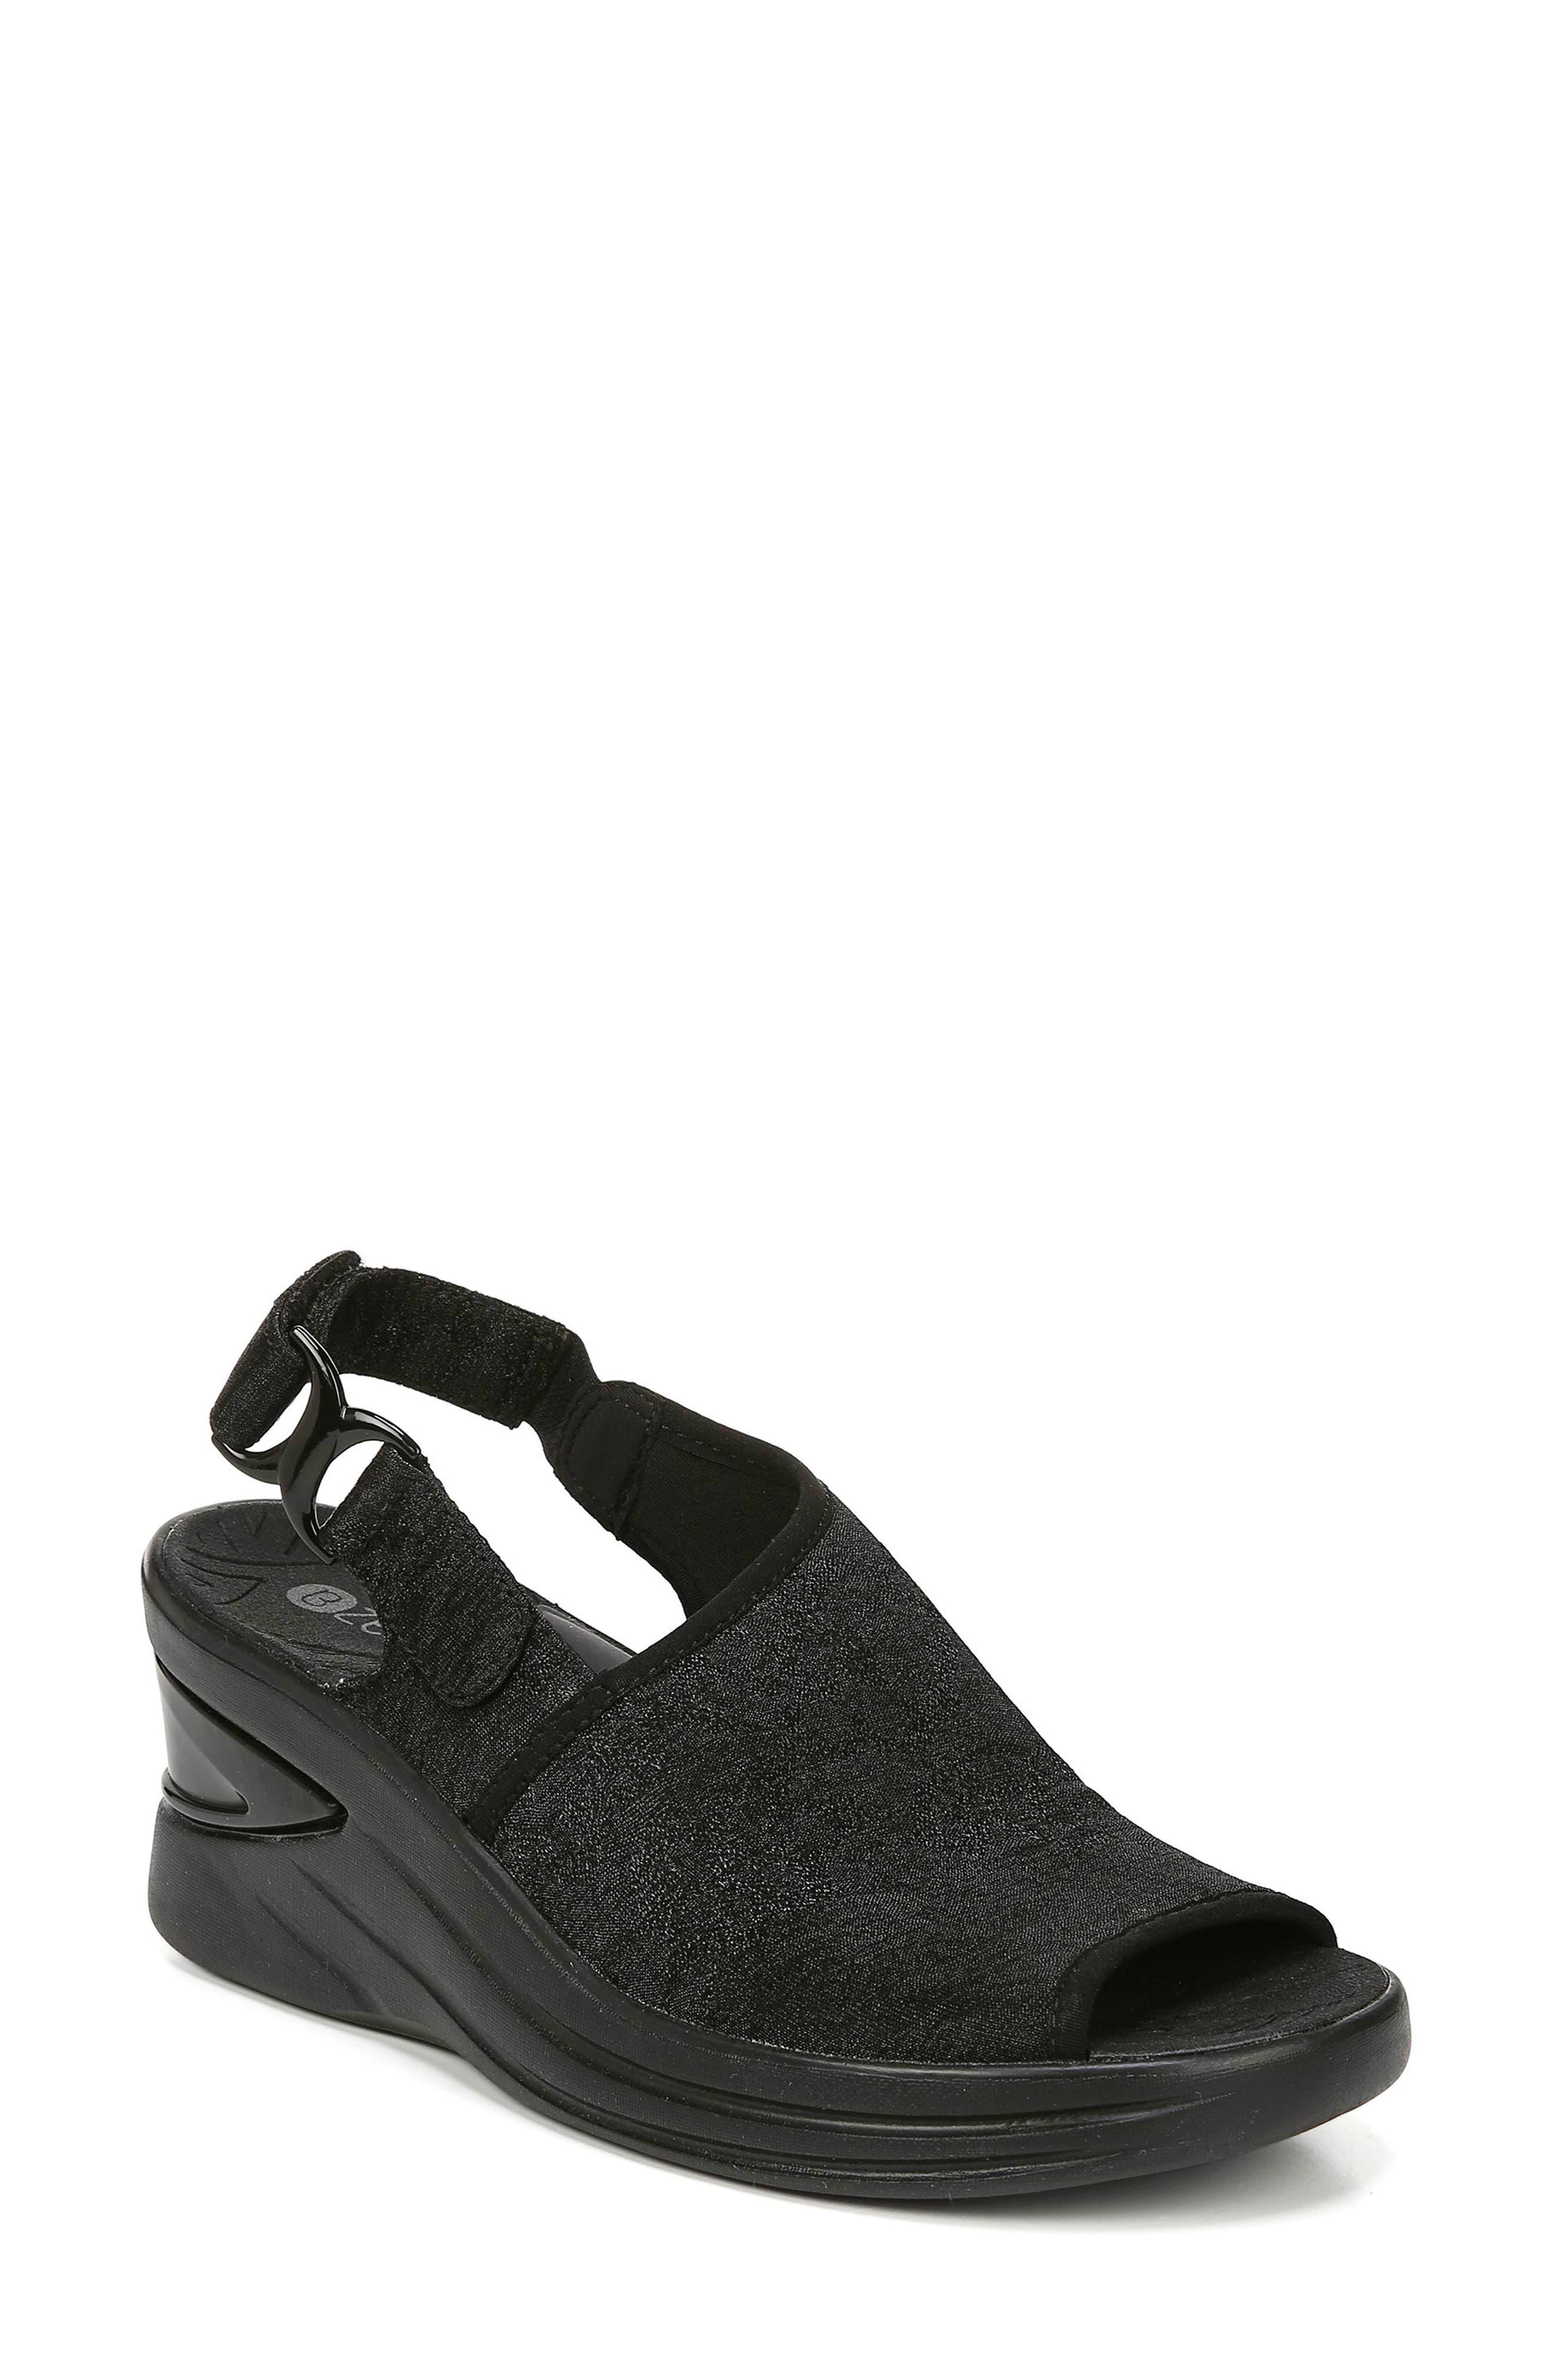 BZEES Vivia Slingback Wedge Sandal, Main, color, BLACK FABRIC